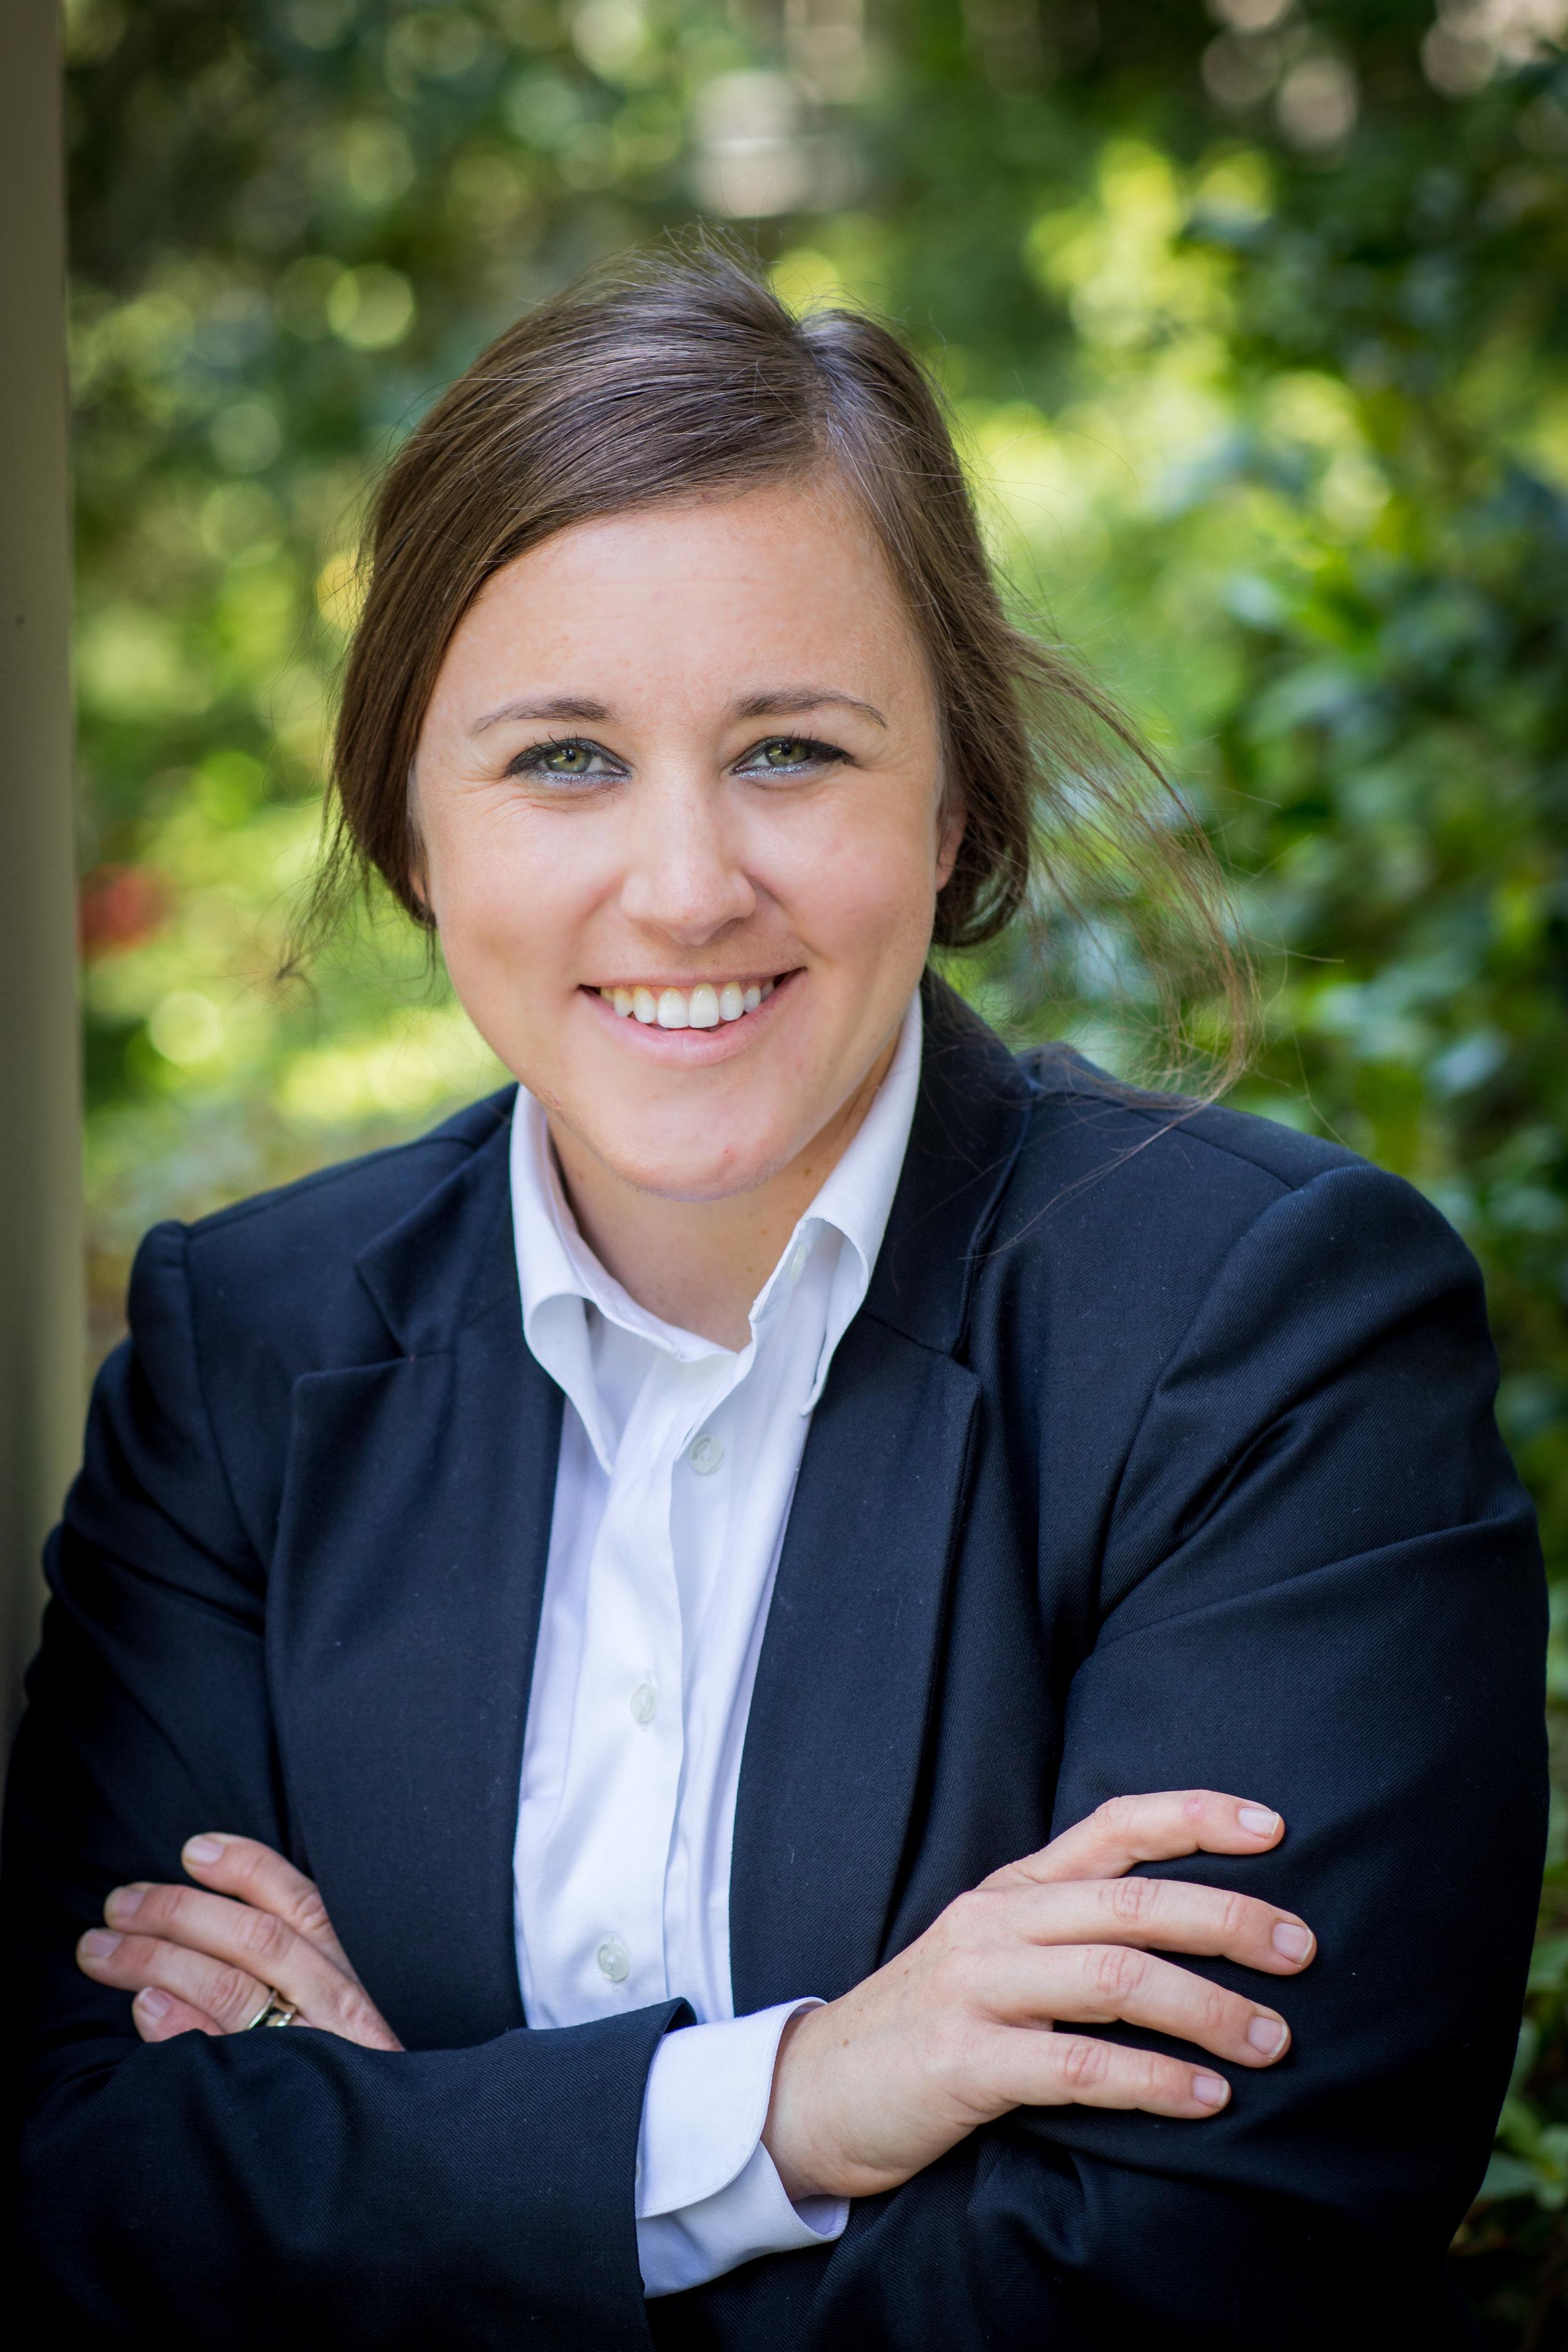 Megan Kiefer accident lawyer New Orleans